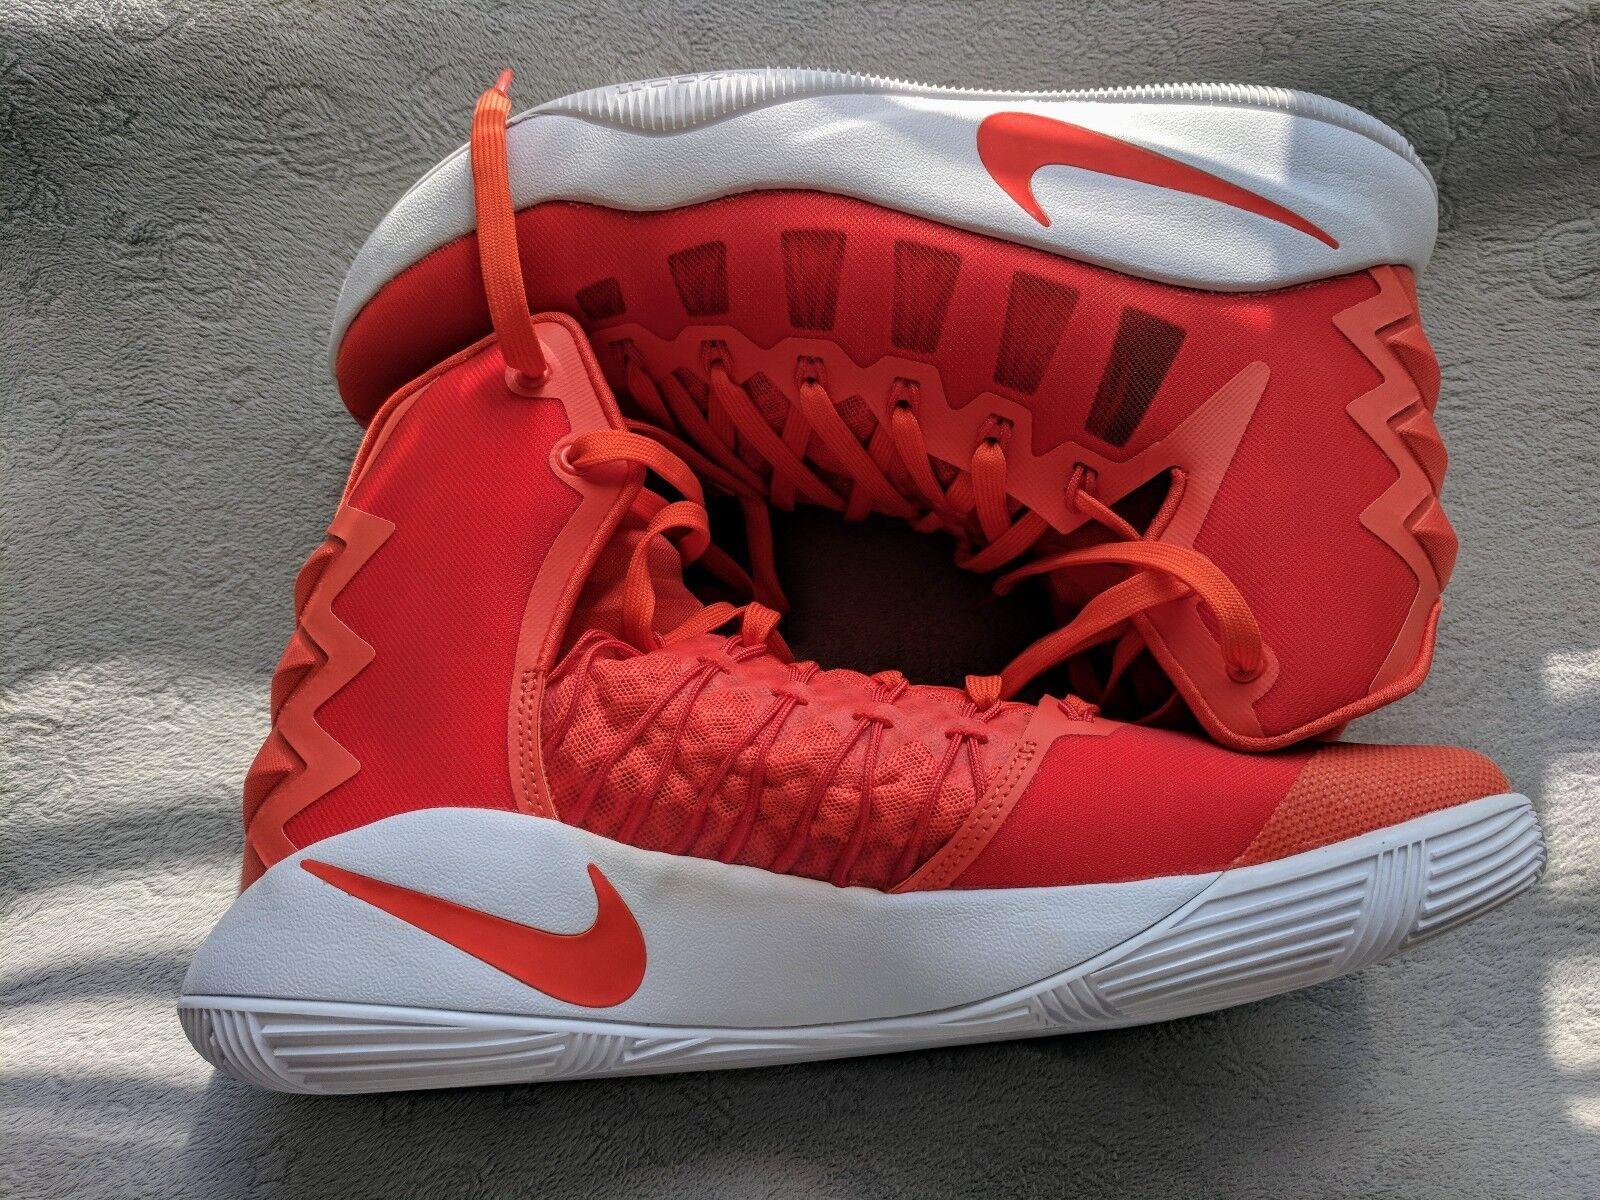 Alta zapatos de TB baloncesto Nike hyperdunk 2018 TB de 844368 881 comodo de color naranja - blanco ed5b1f